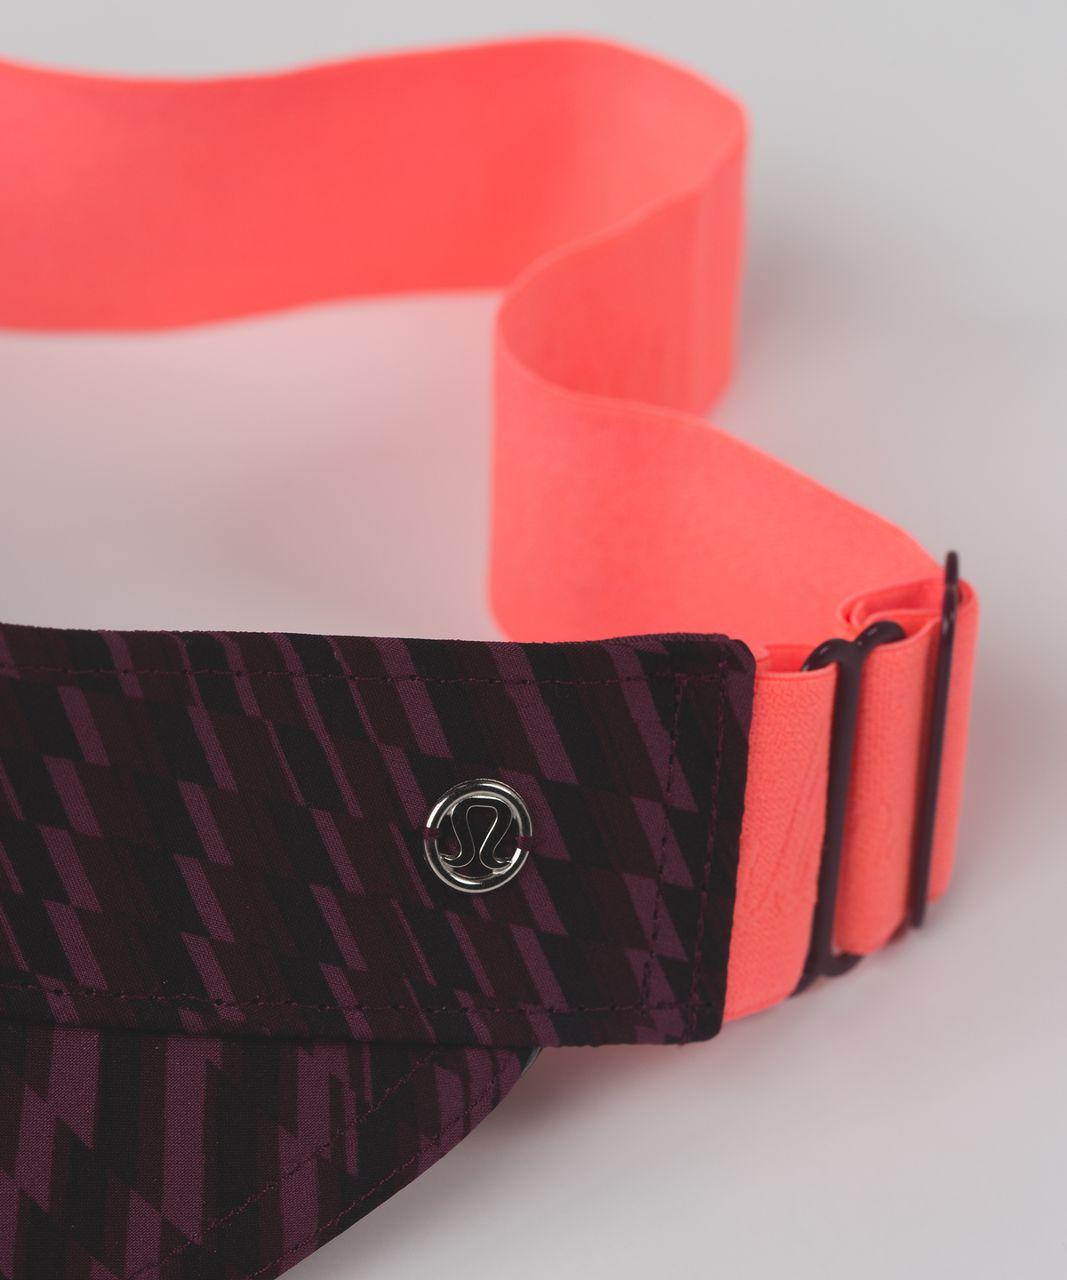 Lululemon Fast Paced Run Visor - Shifted Horizon Red Grape Black / Red Grape